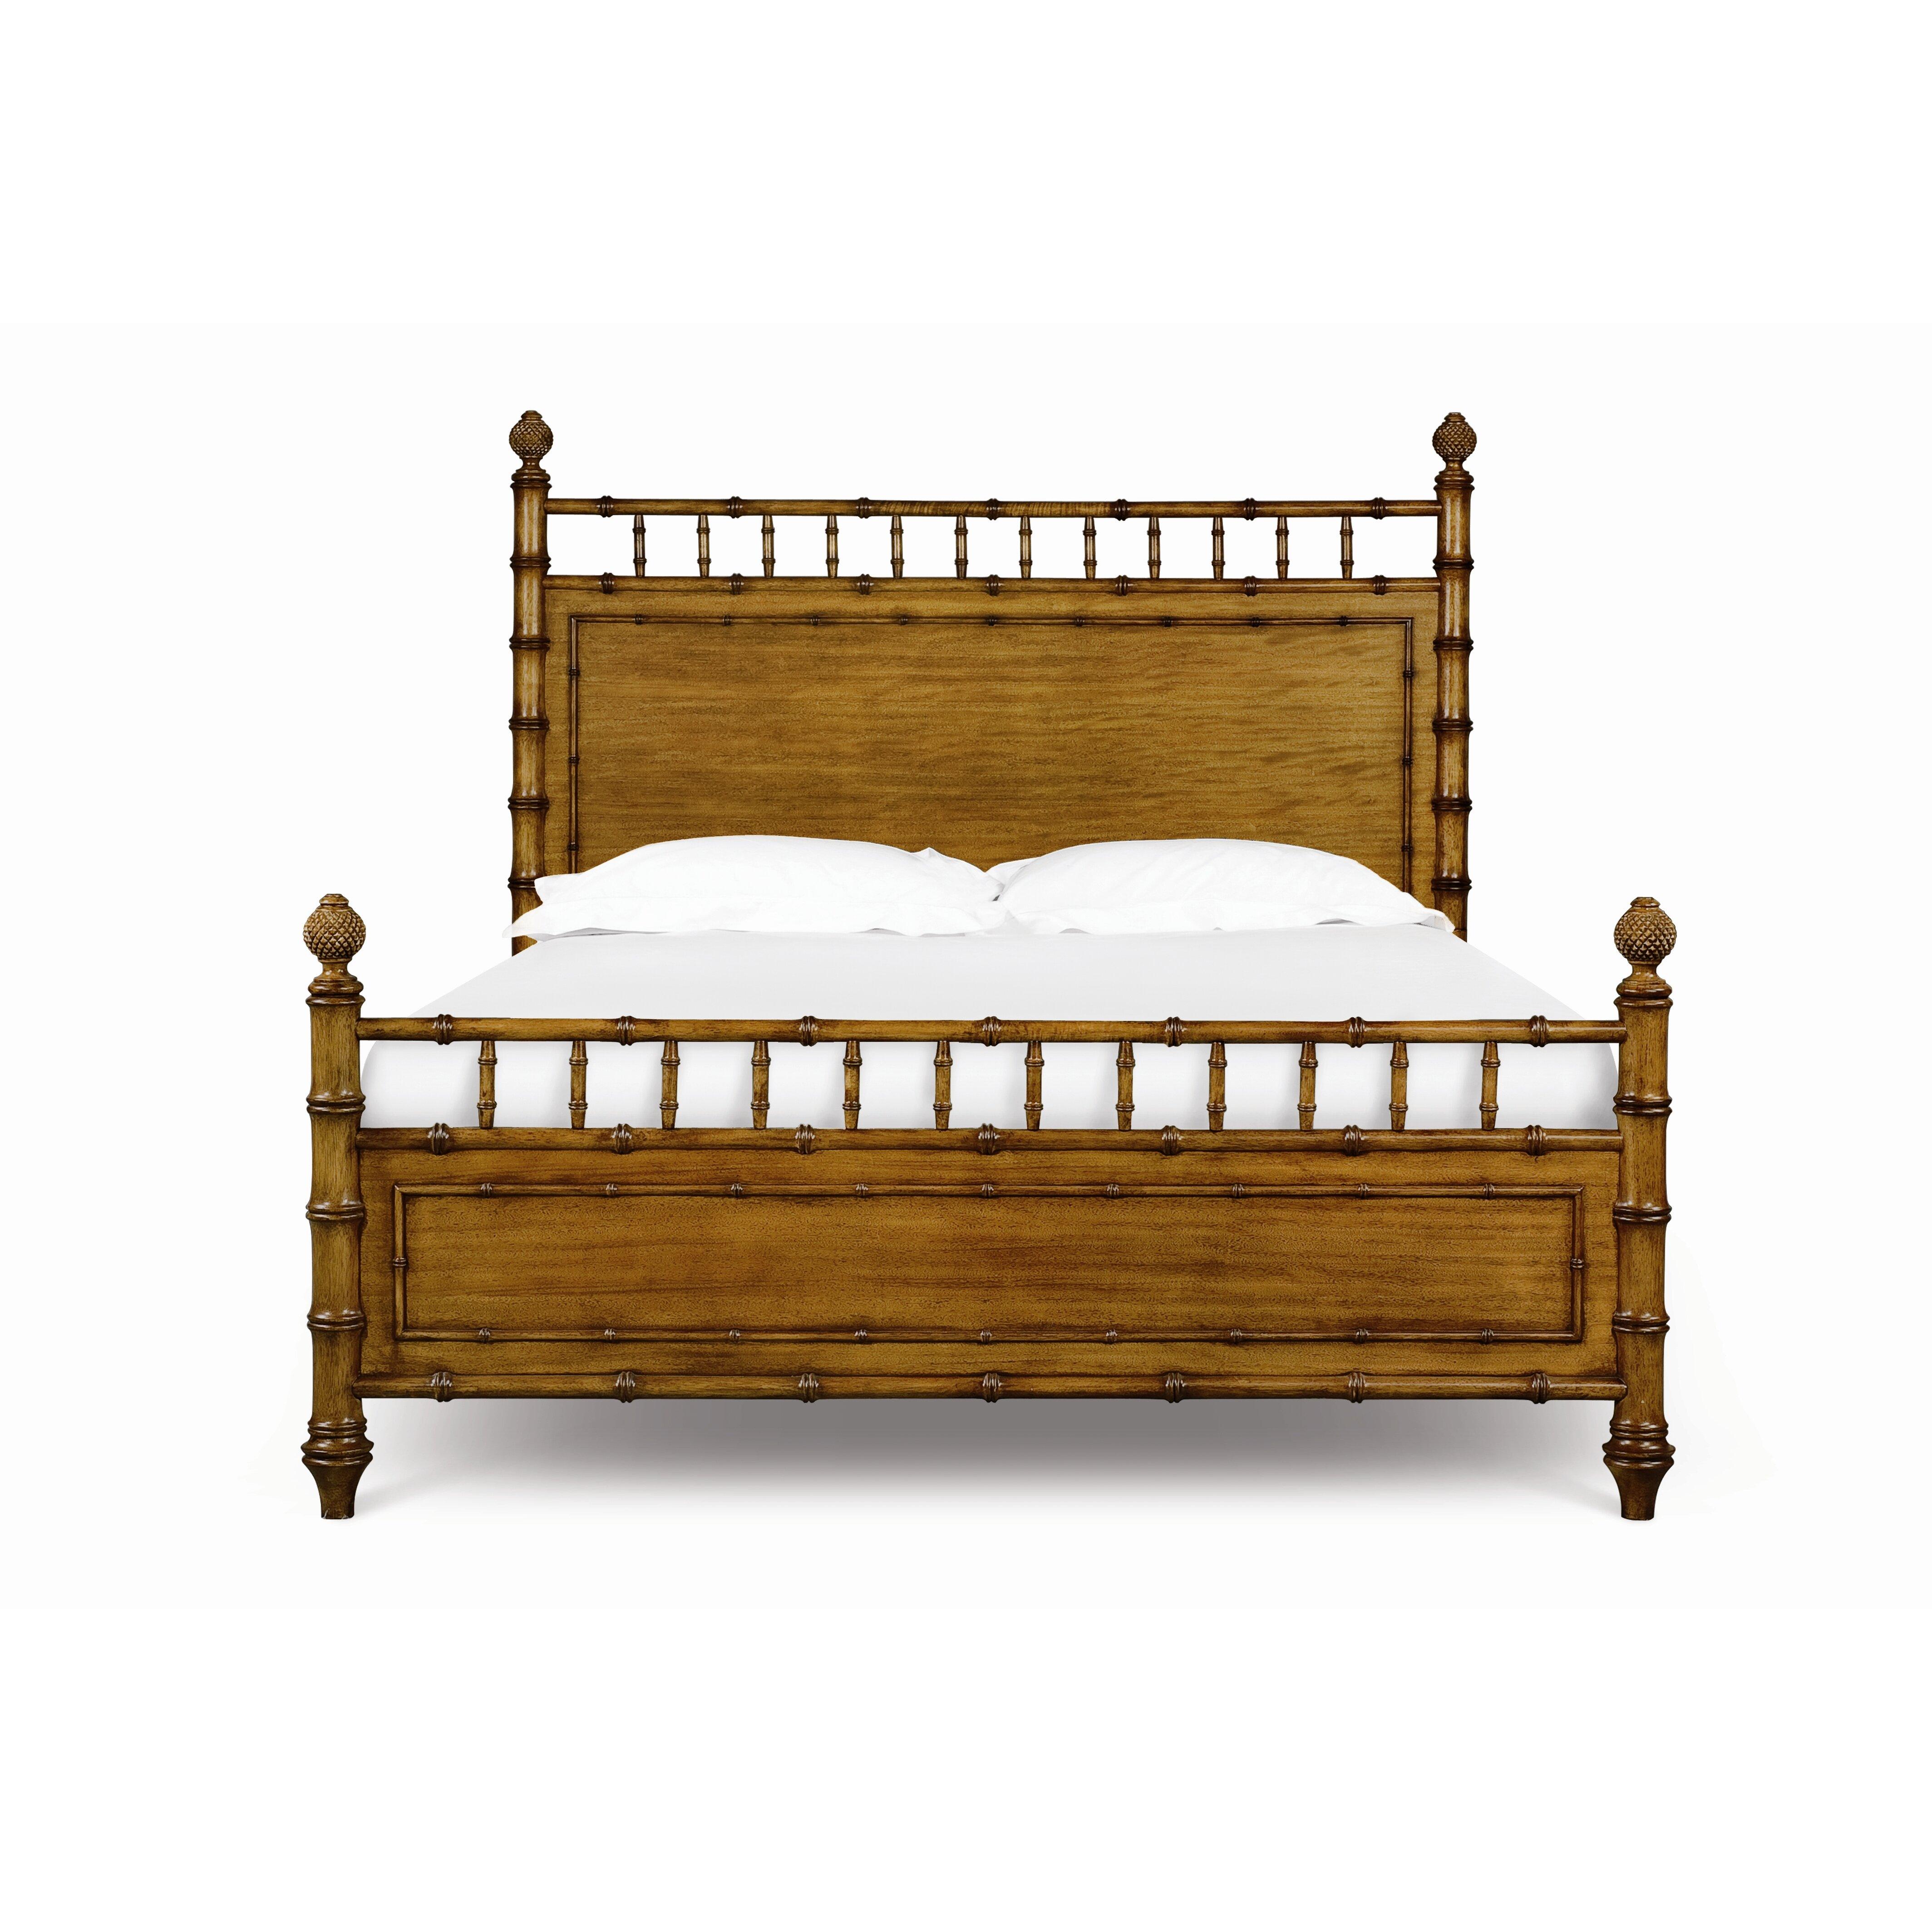 Magnussen palm bay wood headboard reviews wayfair